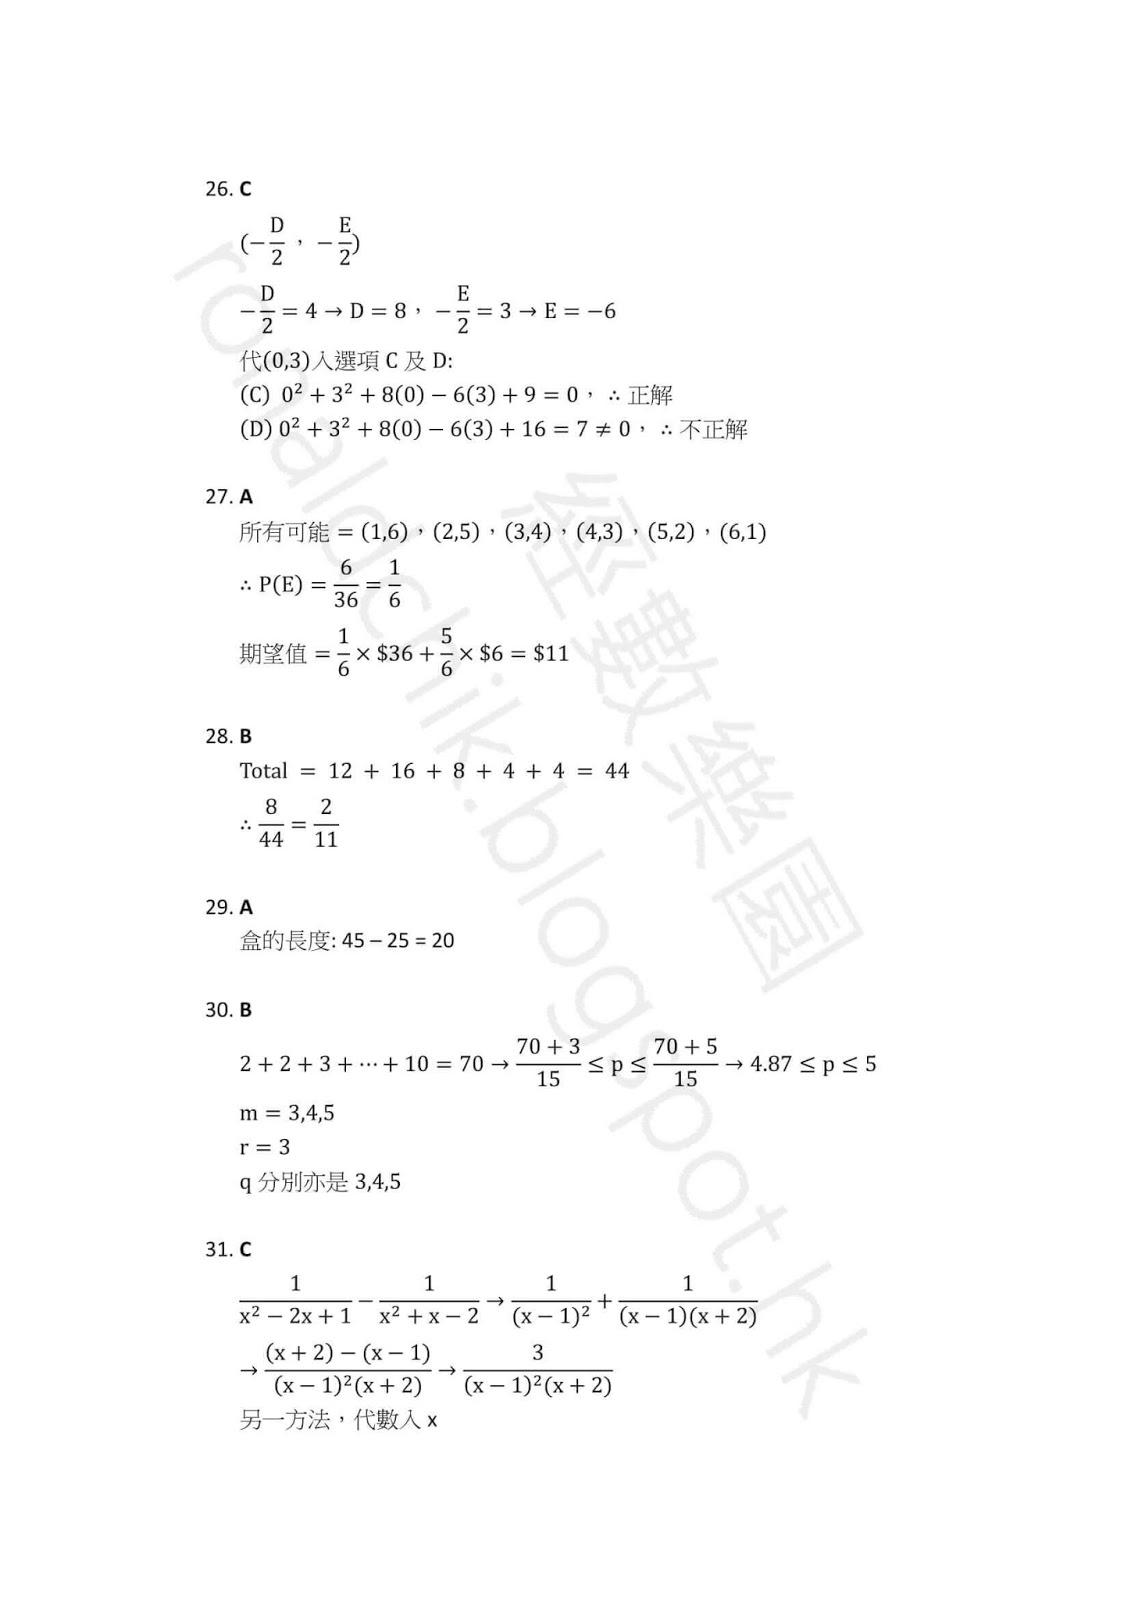 2015 DSE Math 數學 Paper 2 MC 卷二 答案 Q26,27,28,29,30,31